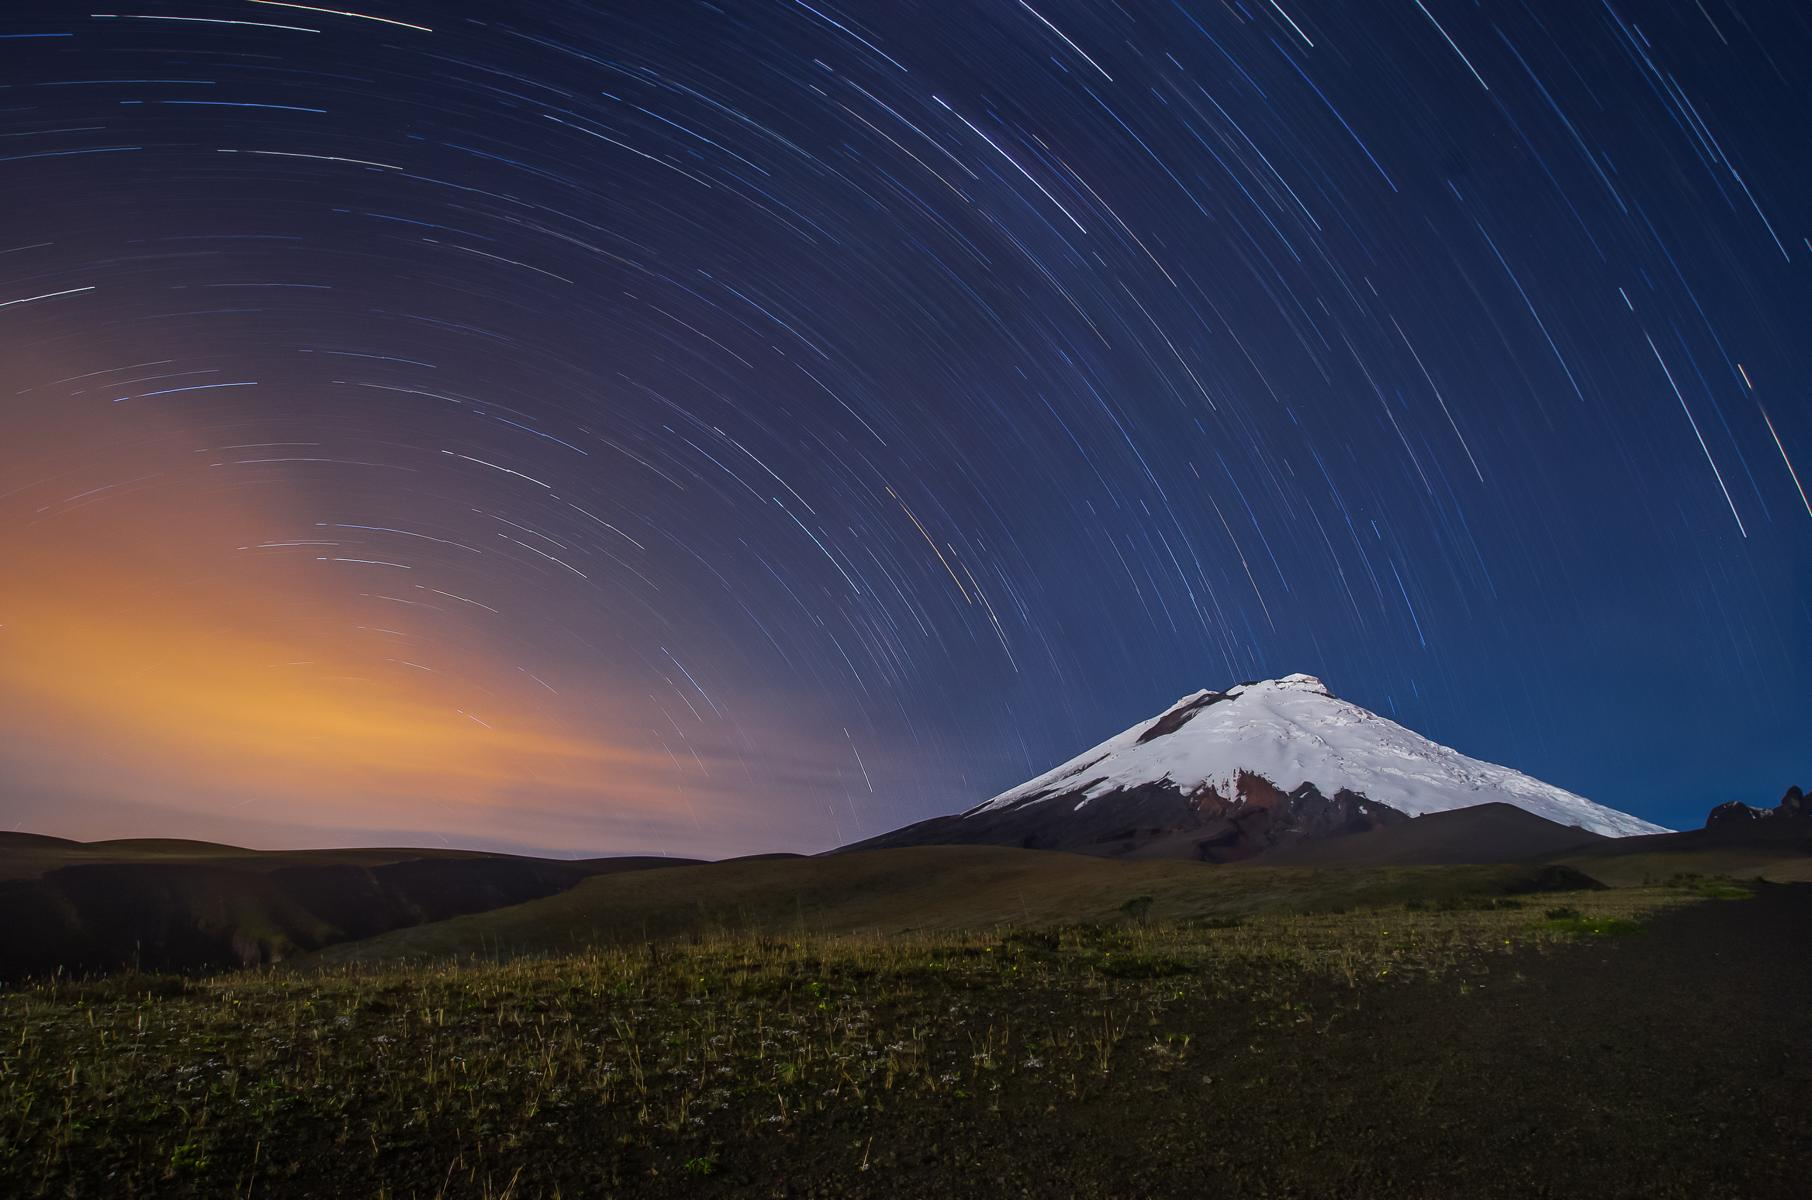 Rundreise - K1600_Cotopaxi-volcano-in-Ecuador-night-shot-with-star-trails-shutterstock_452094196.jpg